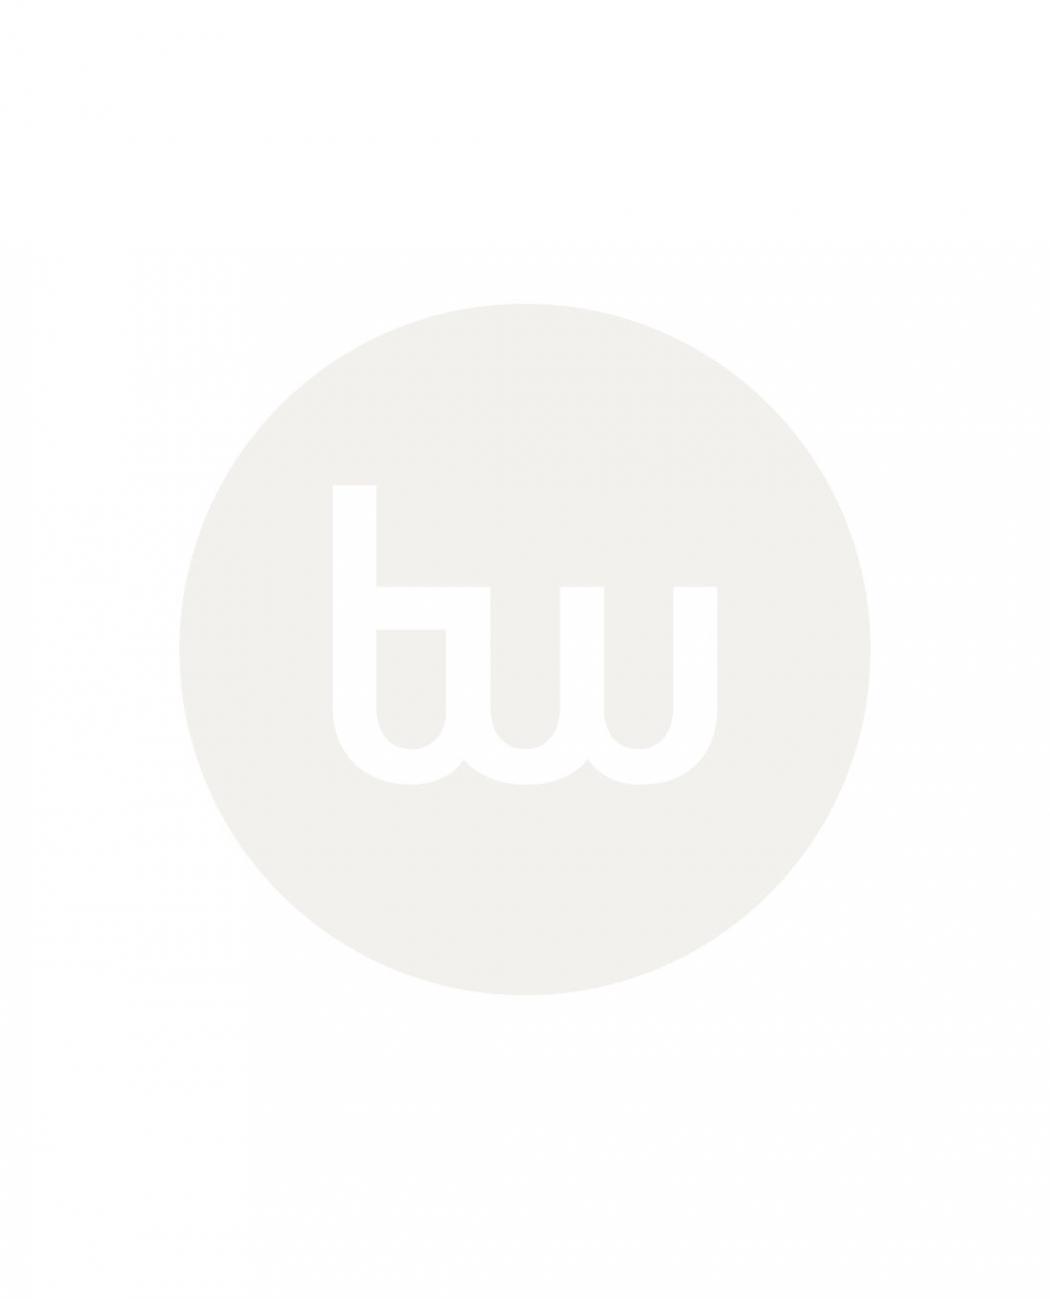 Oakley SI Ballistic Halo Terrain Tan / Grey - TACWRK